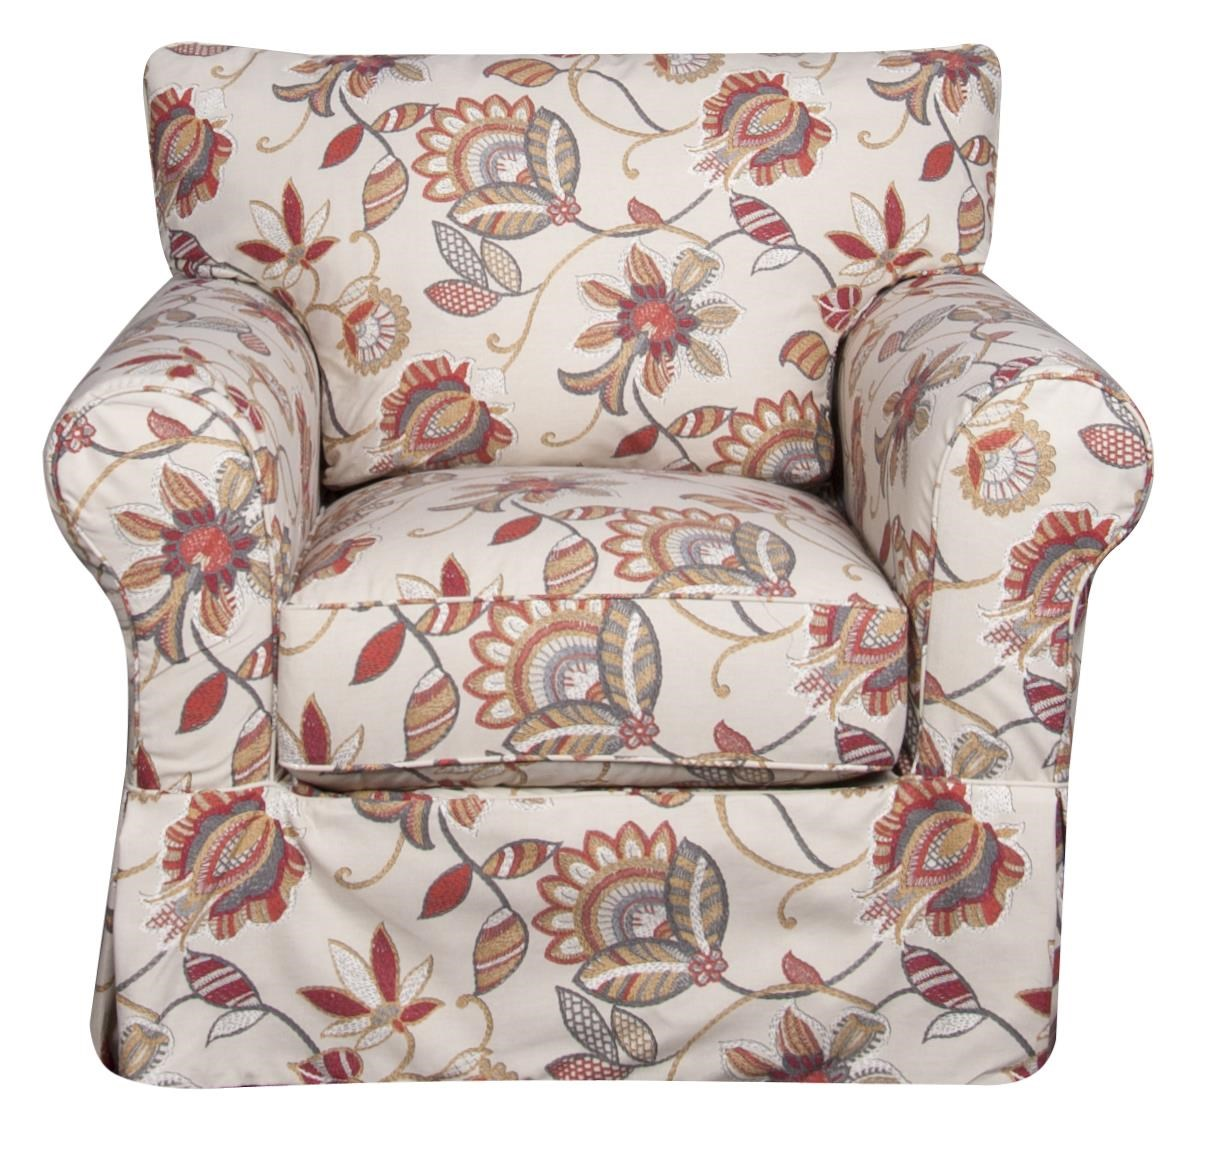 Elliston Place Jordan - Jordan Chair - Item Number: 321381199